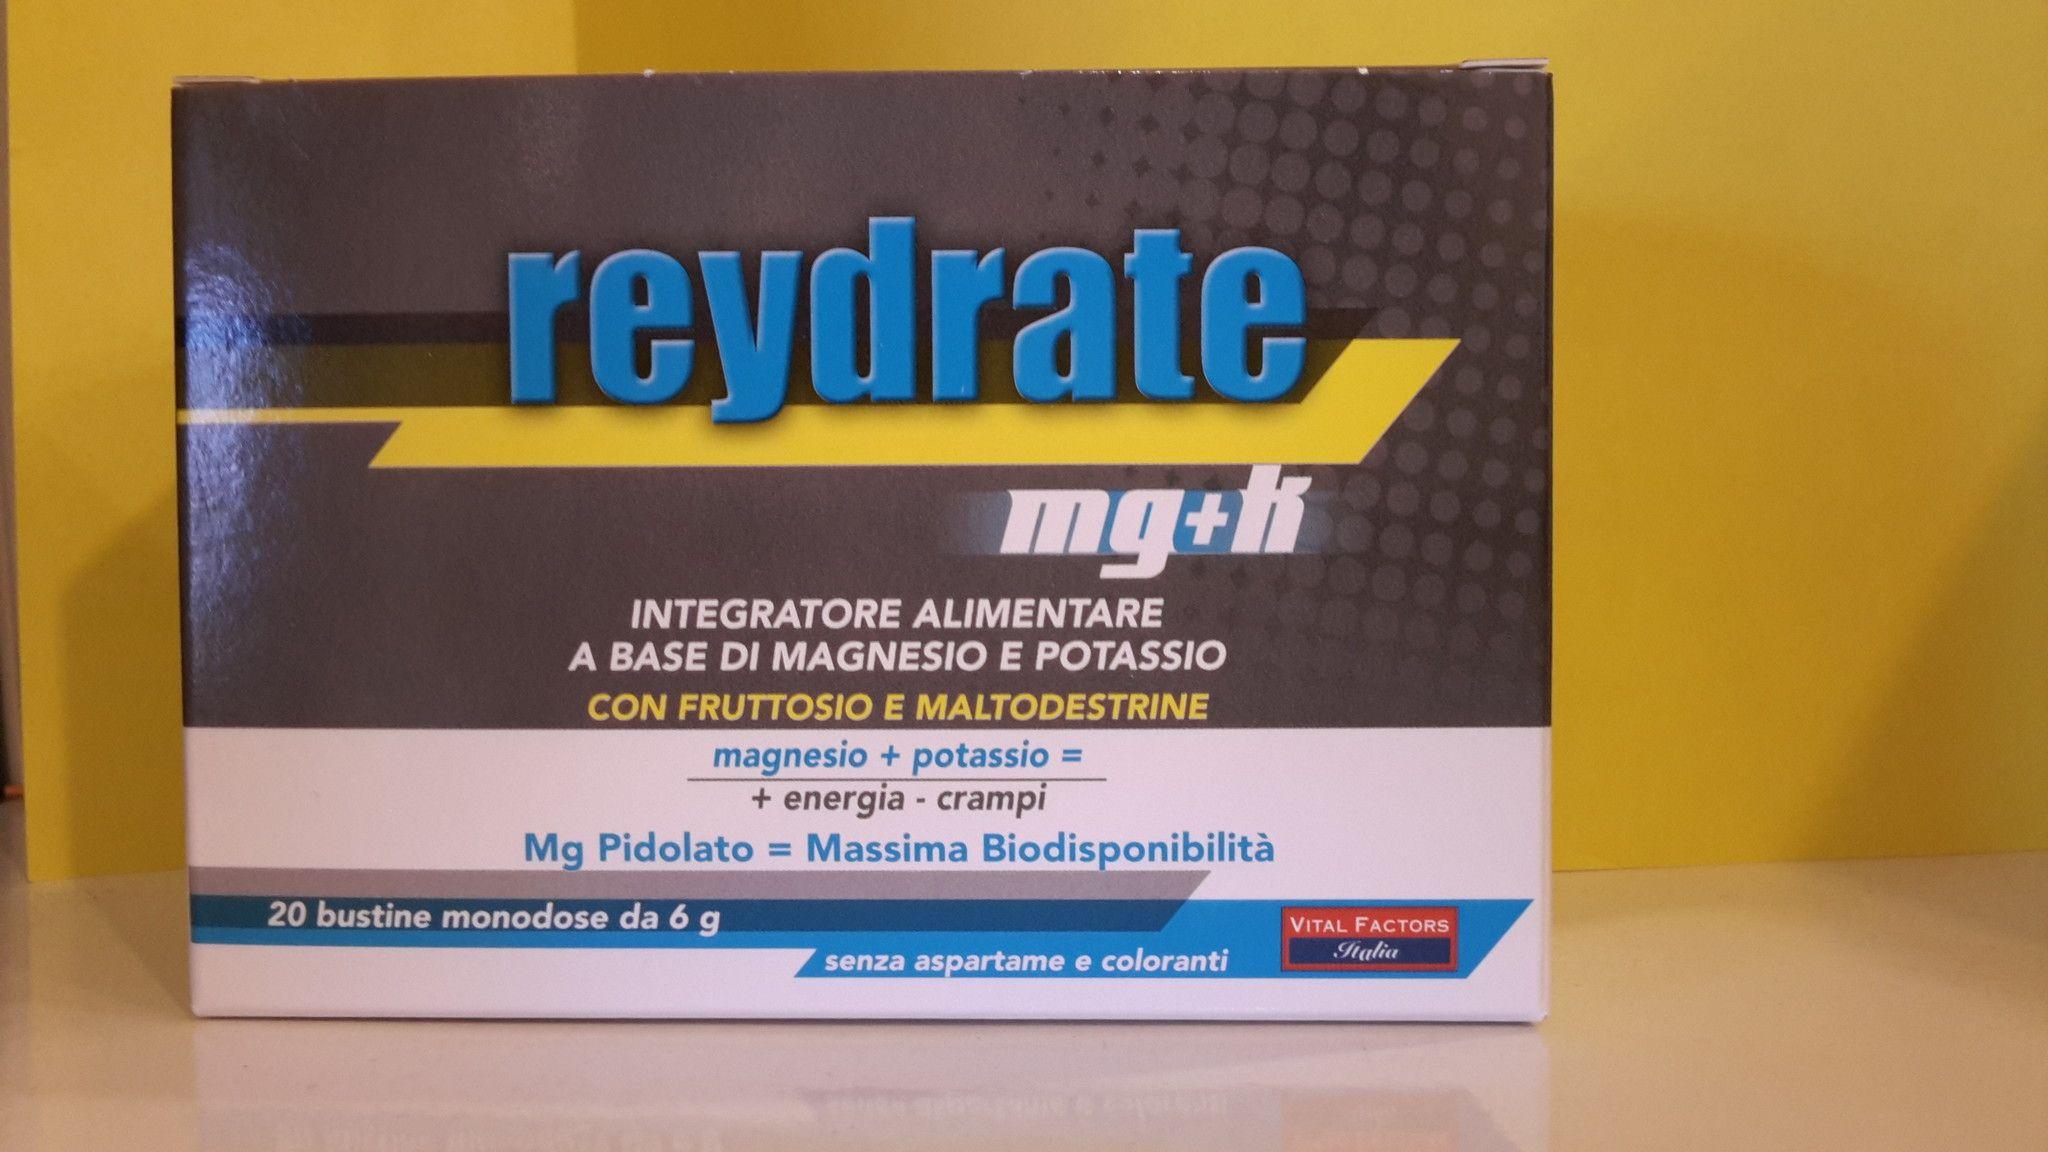 REYDRATE  Magnesio + Potassio  20  Buste - Vital Factors